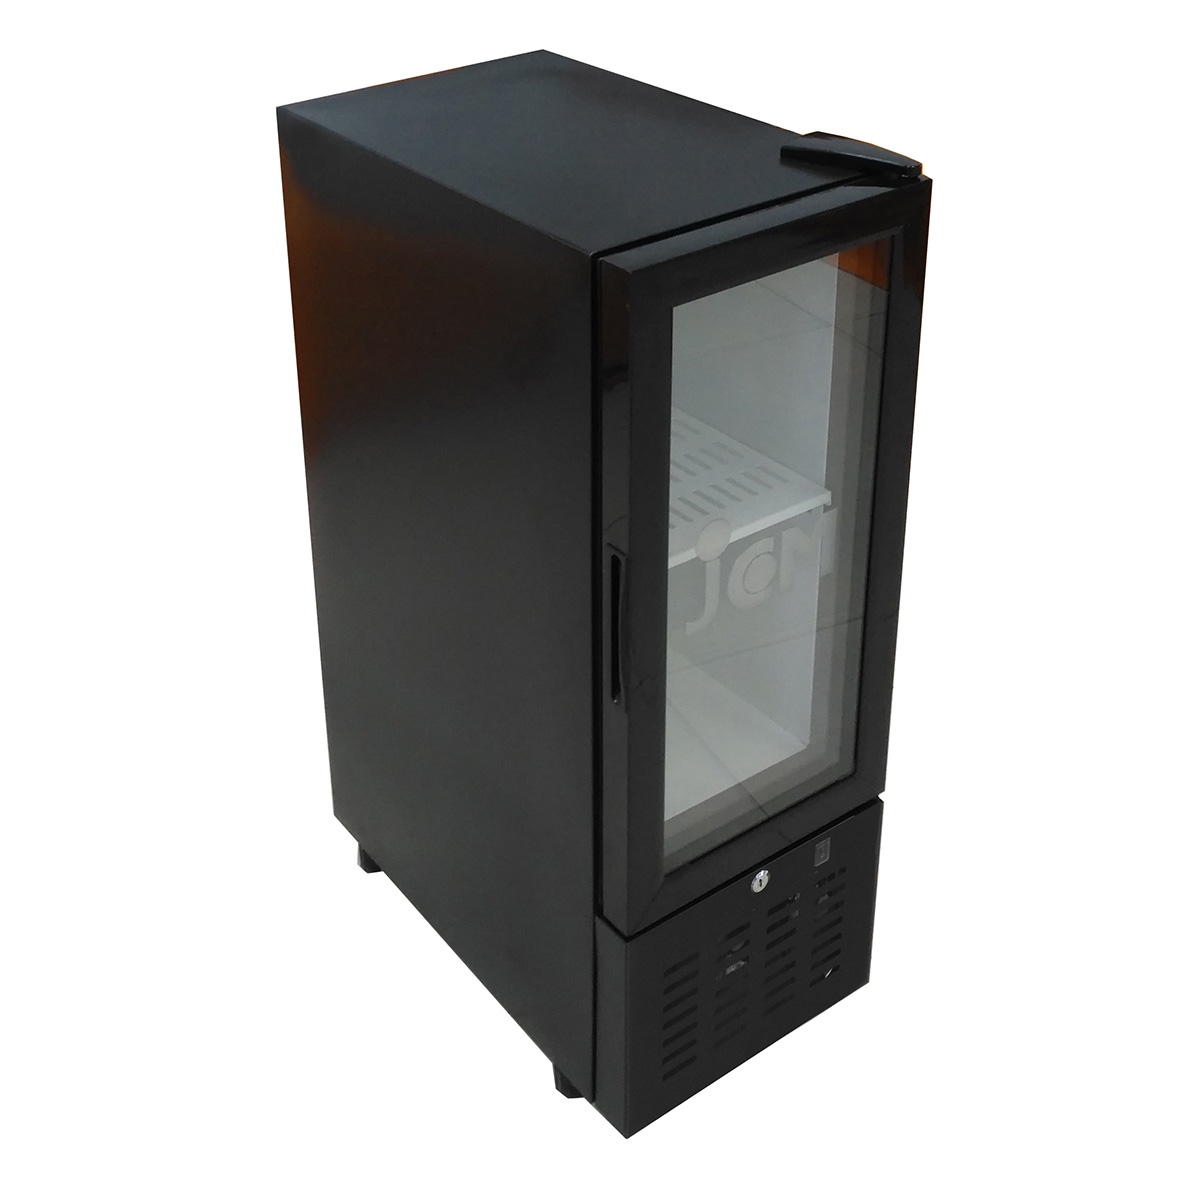 JCM 卓上型冷蔵ショーケース JCMS-47 47L 業務用 冷蔵 保冷庫 ショーケース 卓上型 LED 【代引不可】